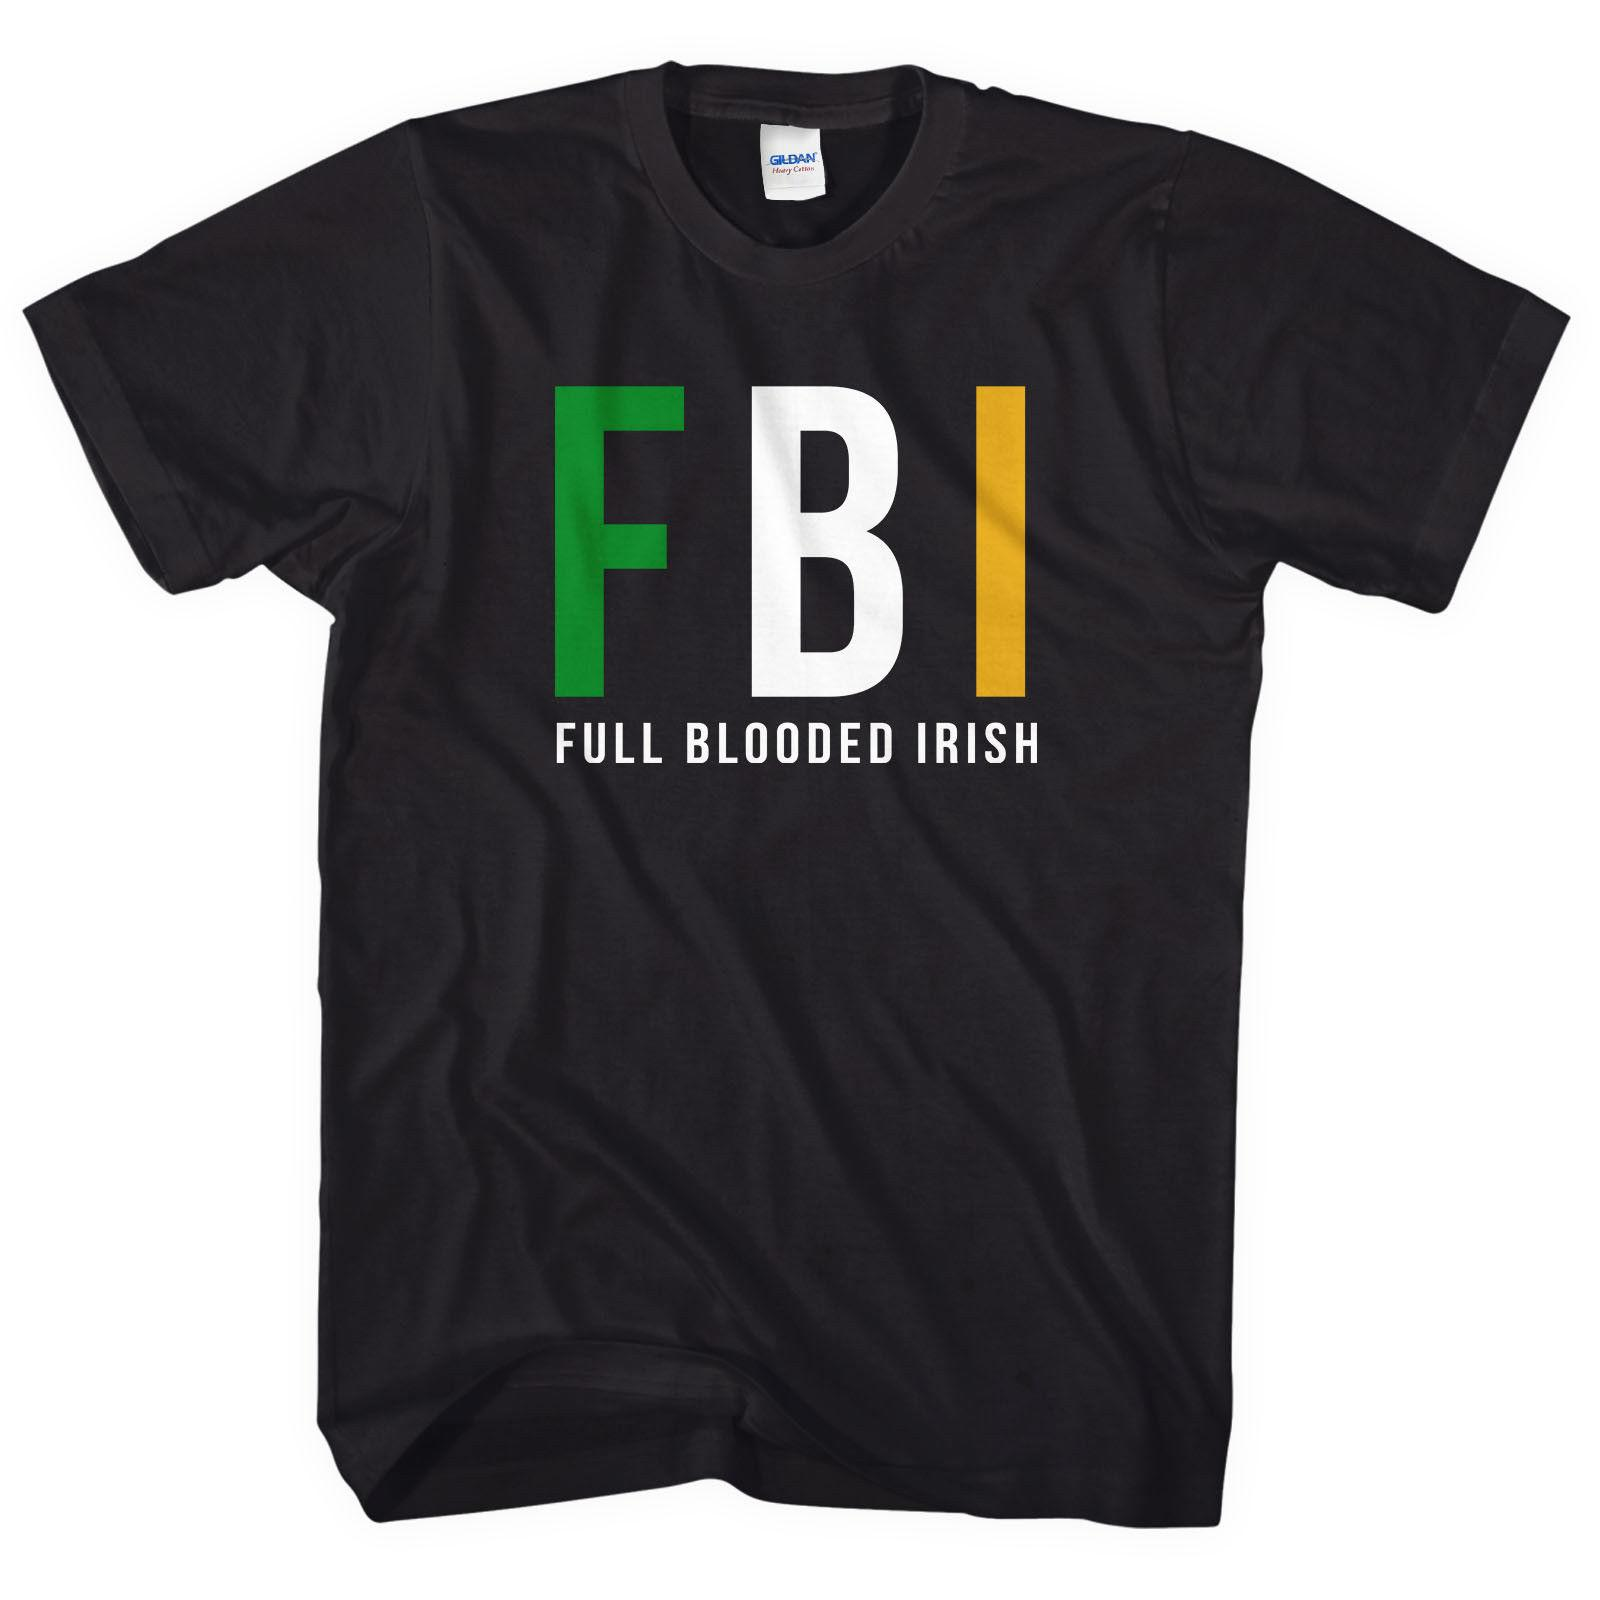 adfa1a4d8cea FBI Full Blooded Irish T Shirt St Patricks Day Ireland Top Shirt Men Women  L249 Cool Casual Pride T Shirt Men Online Tee Shirts Shopping Funniest Tee  Shirts ...